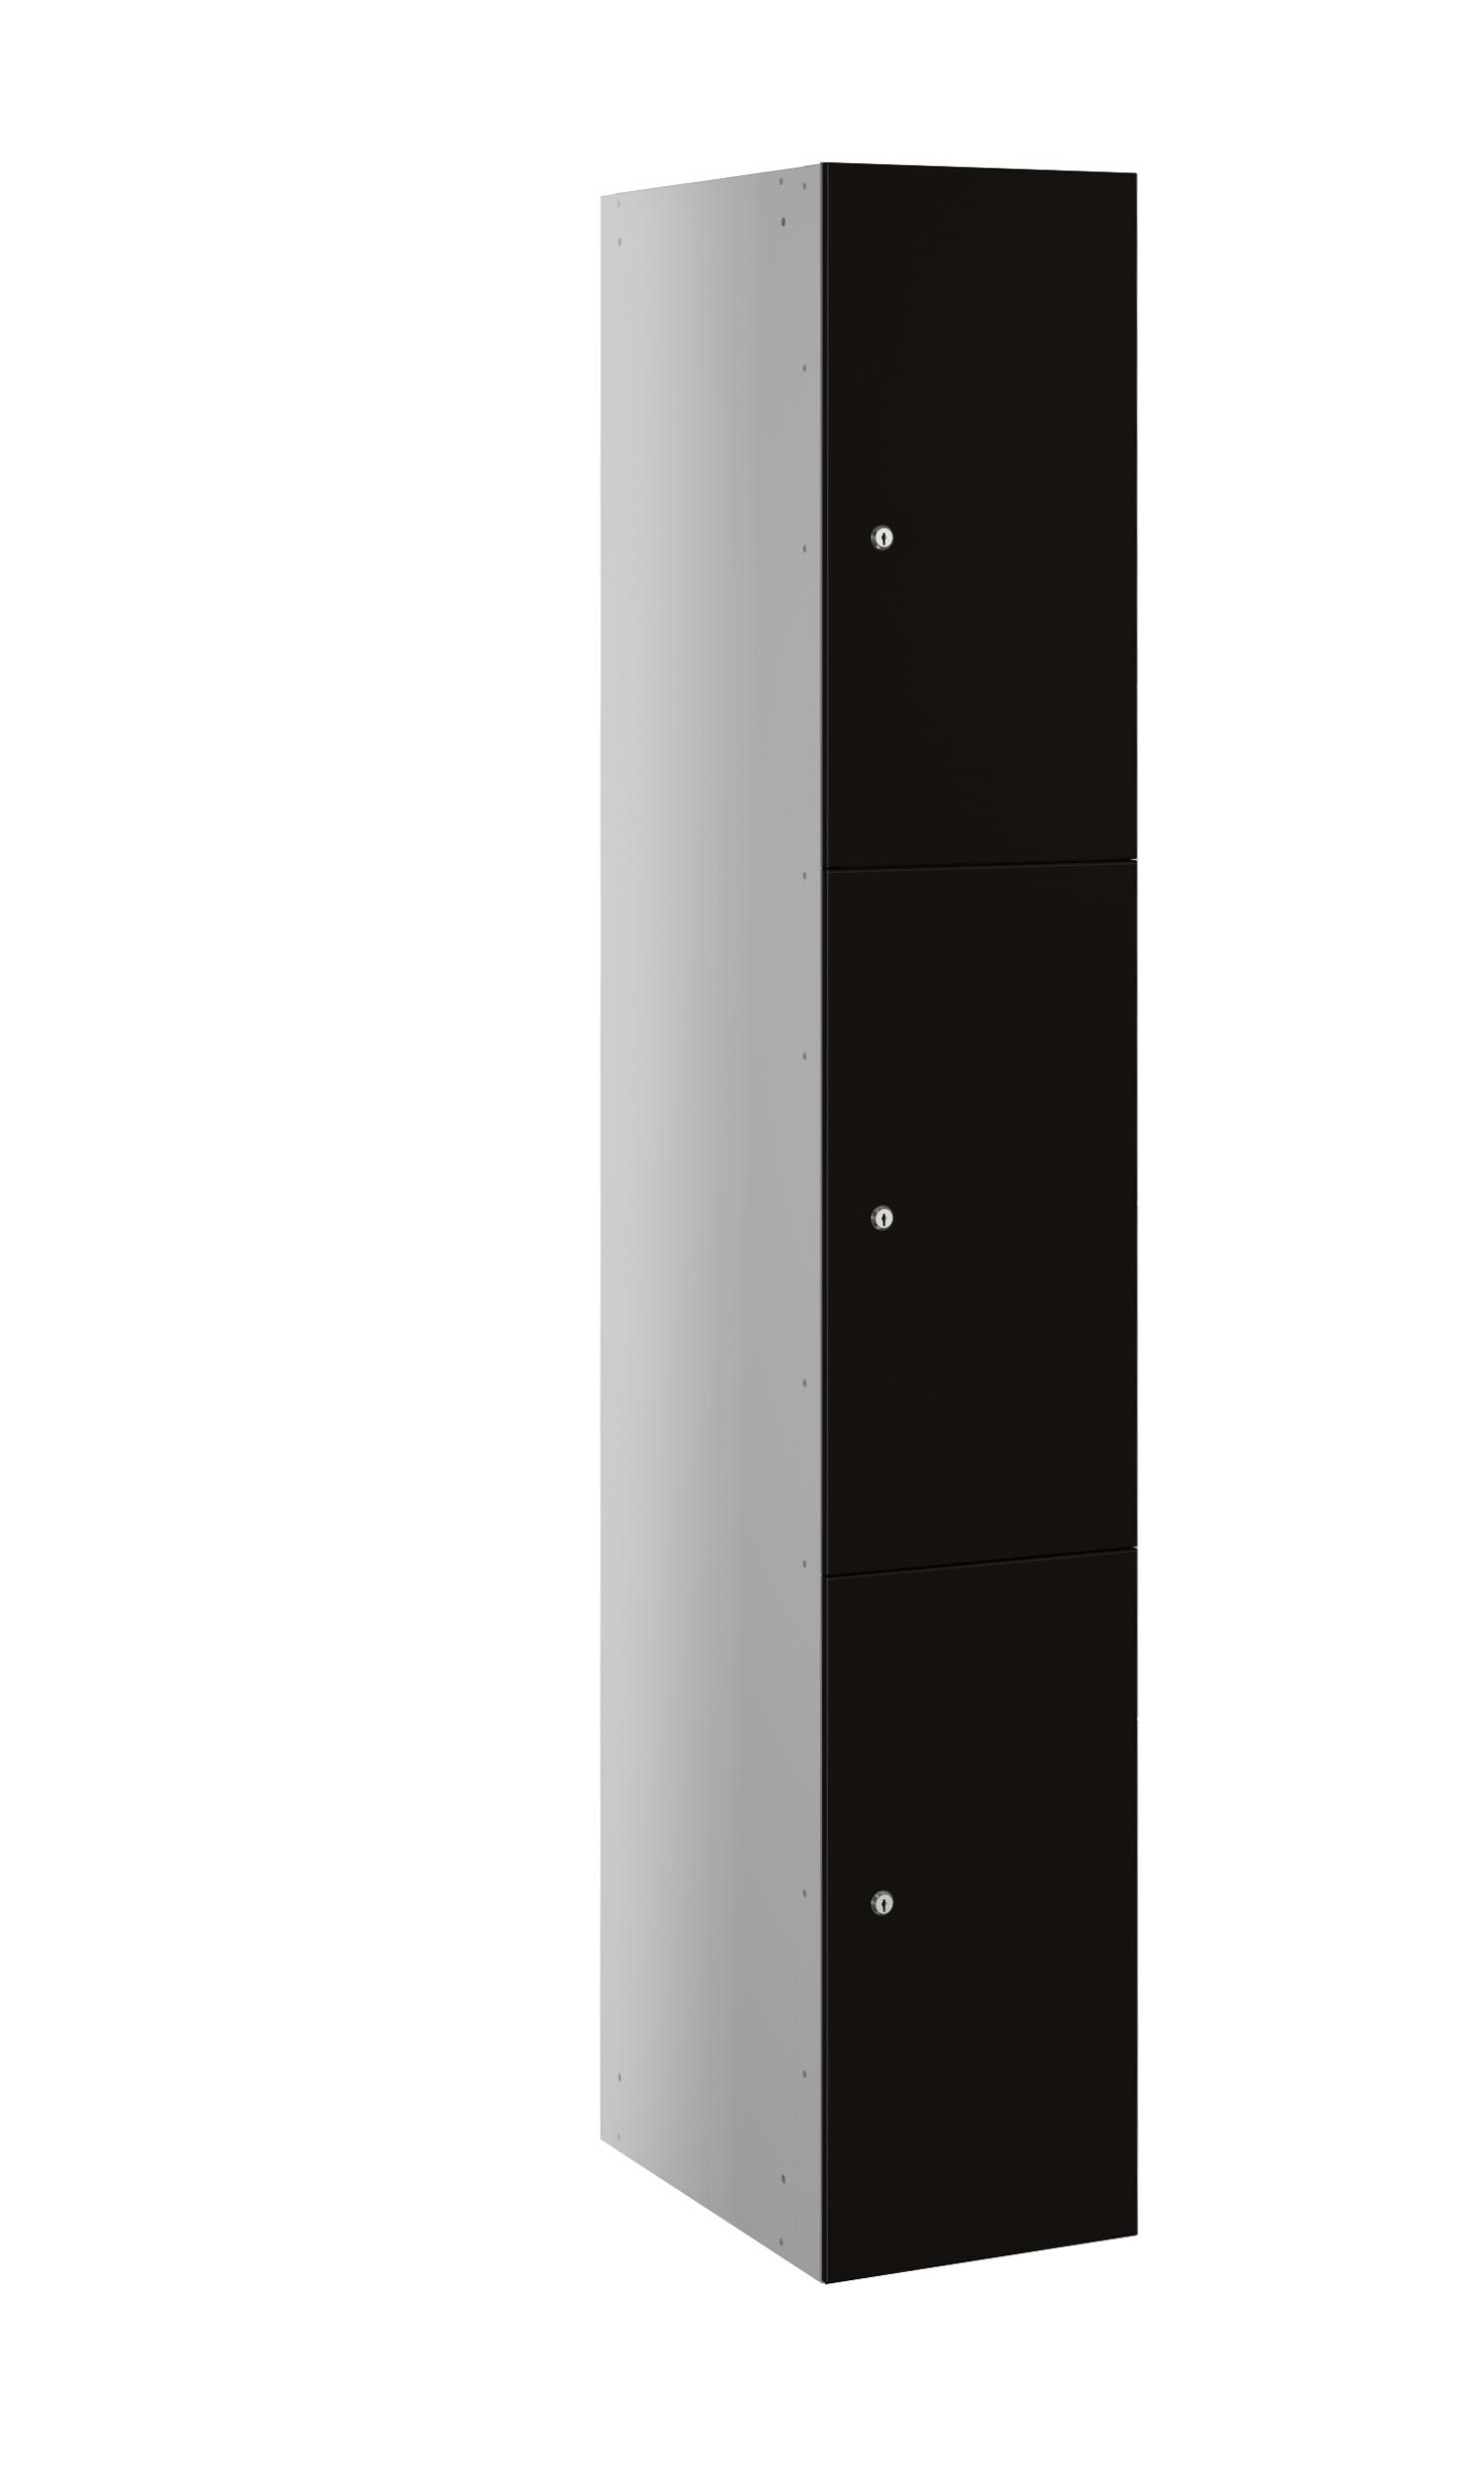 Probe buzzbox laminate 3 doors anthracite